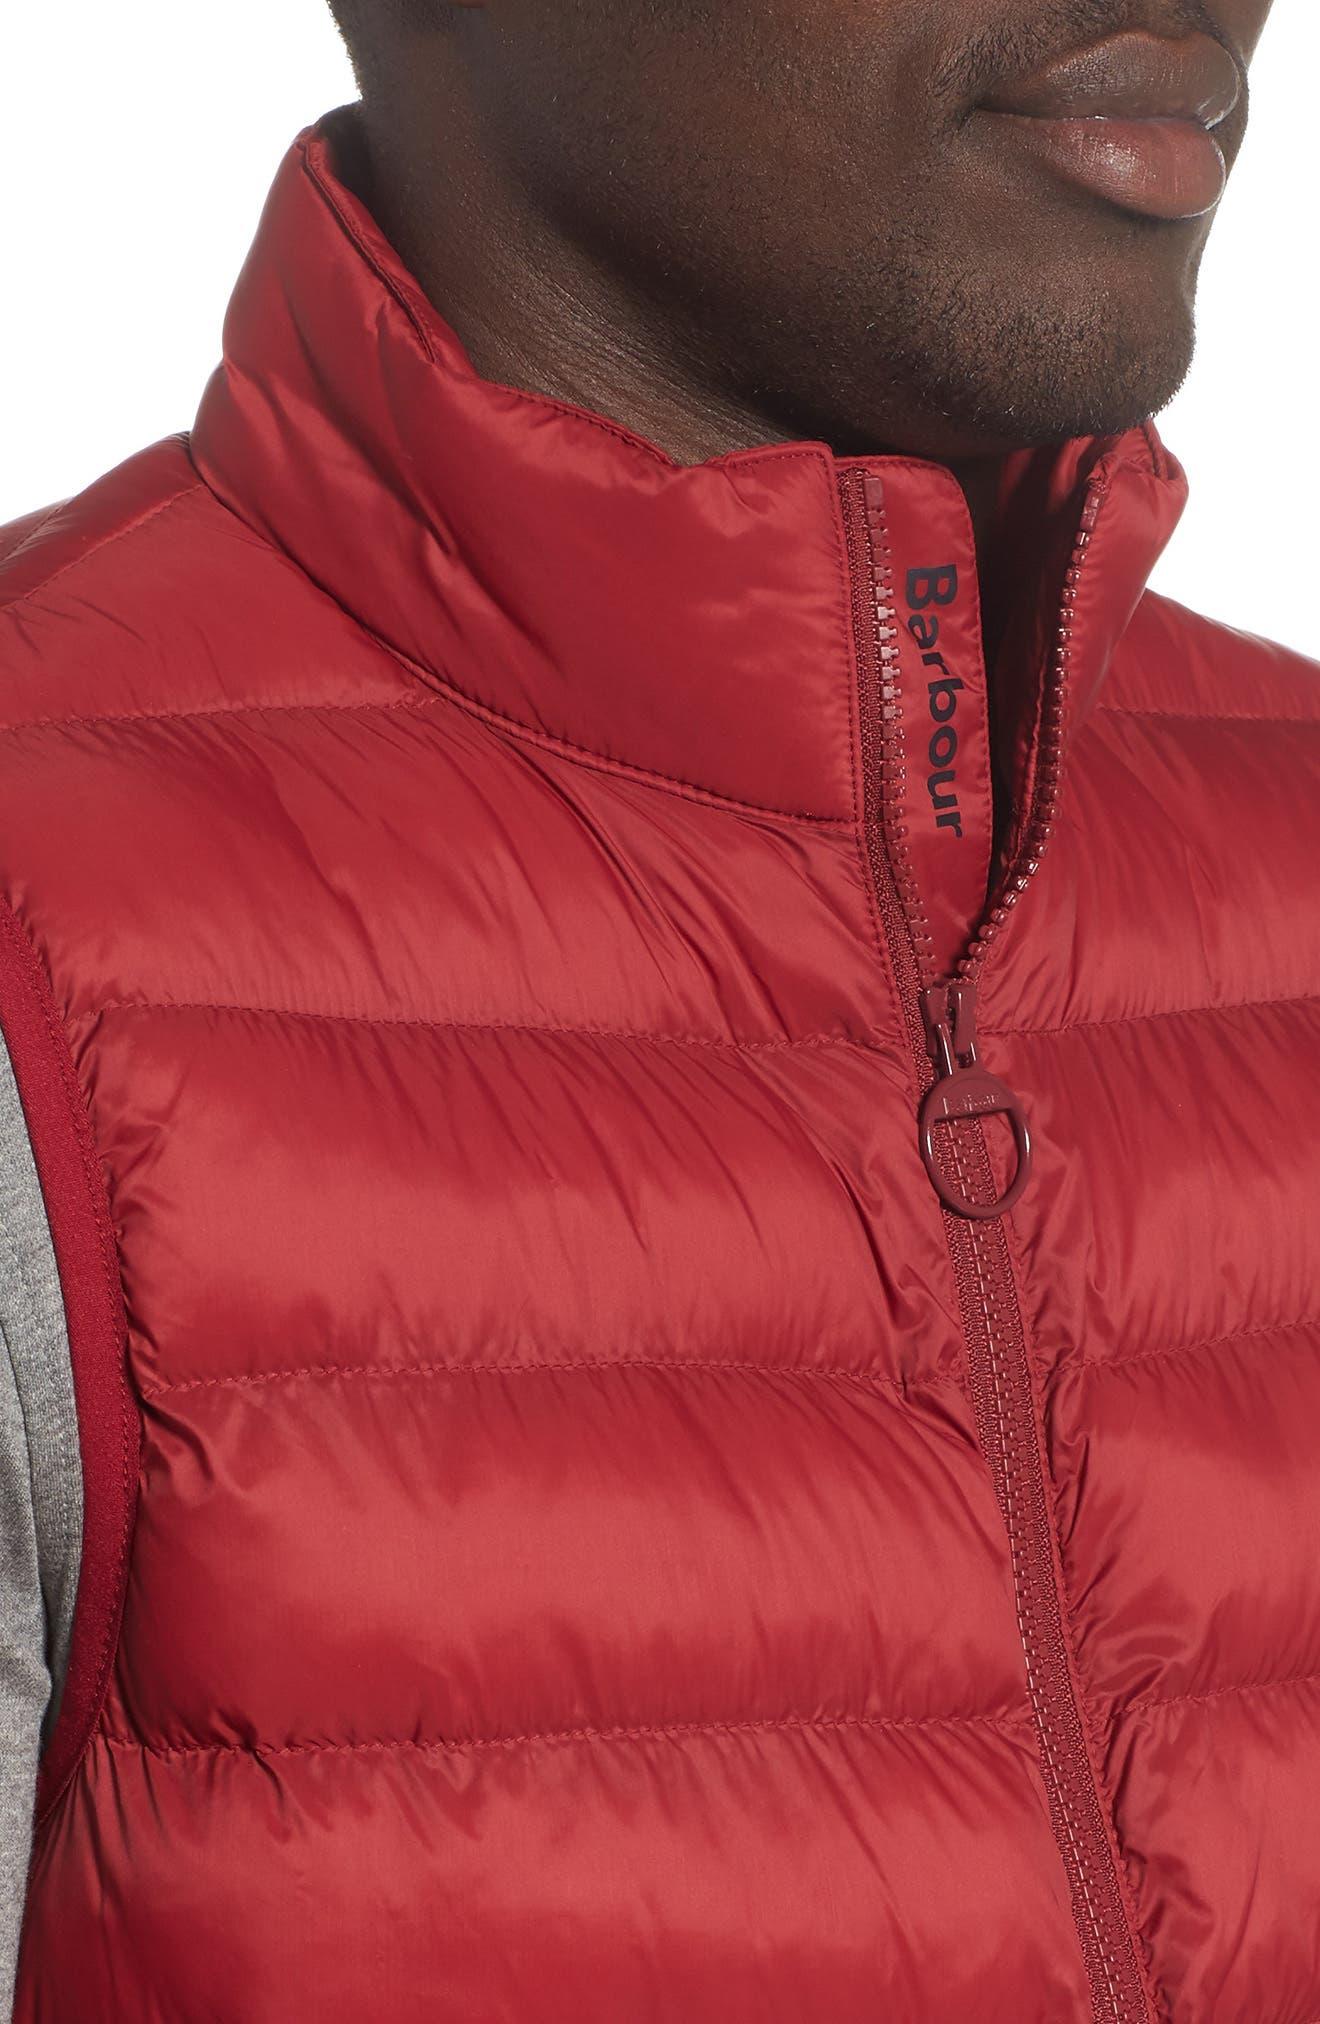 Askham Quilted Vest,                             Alternate thumbnail 4, color,                             Biking Red